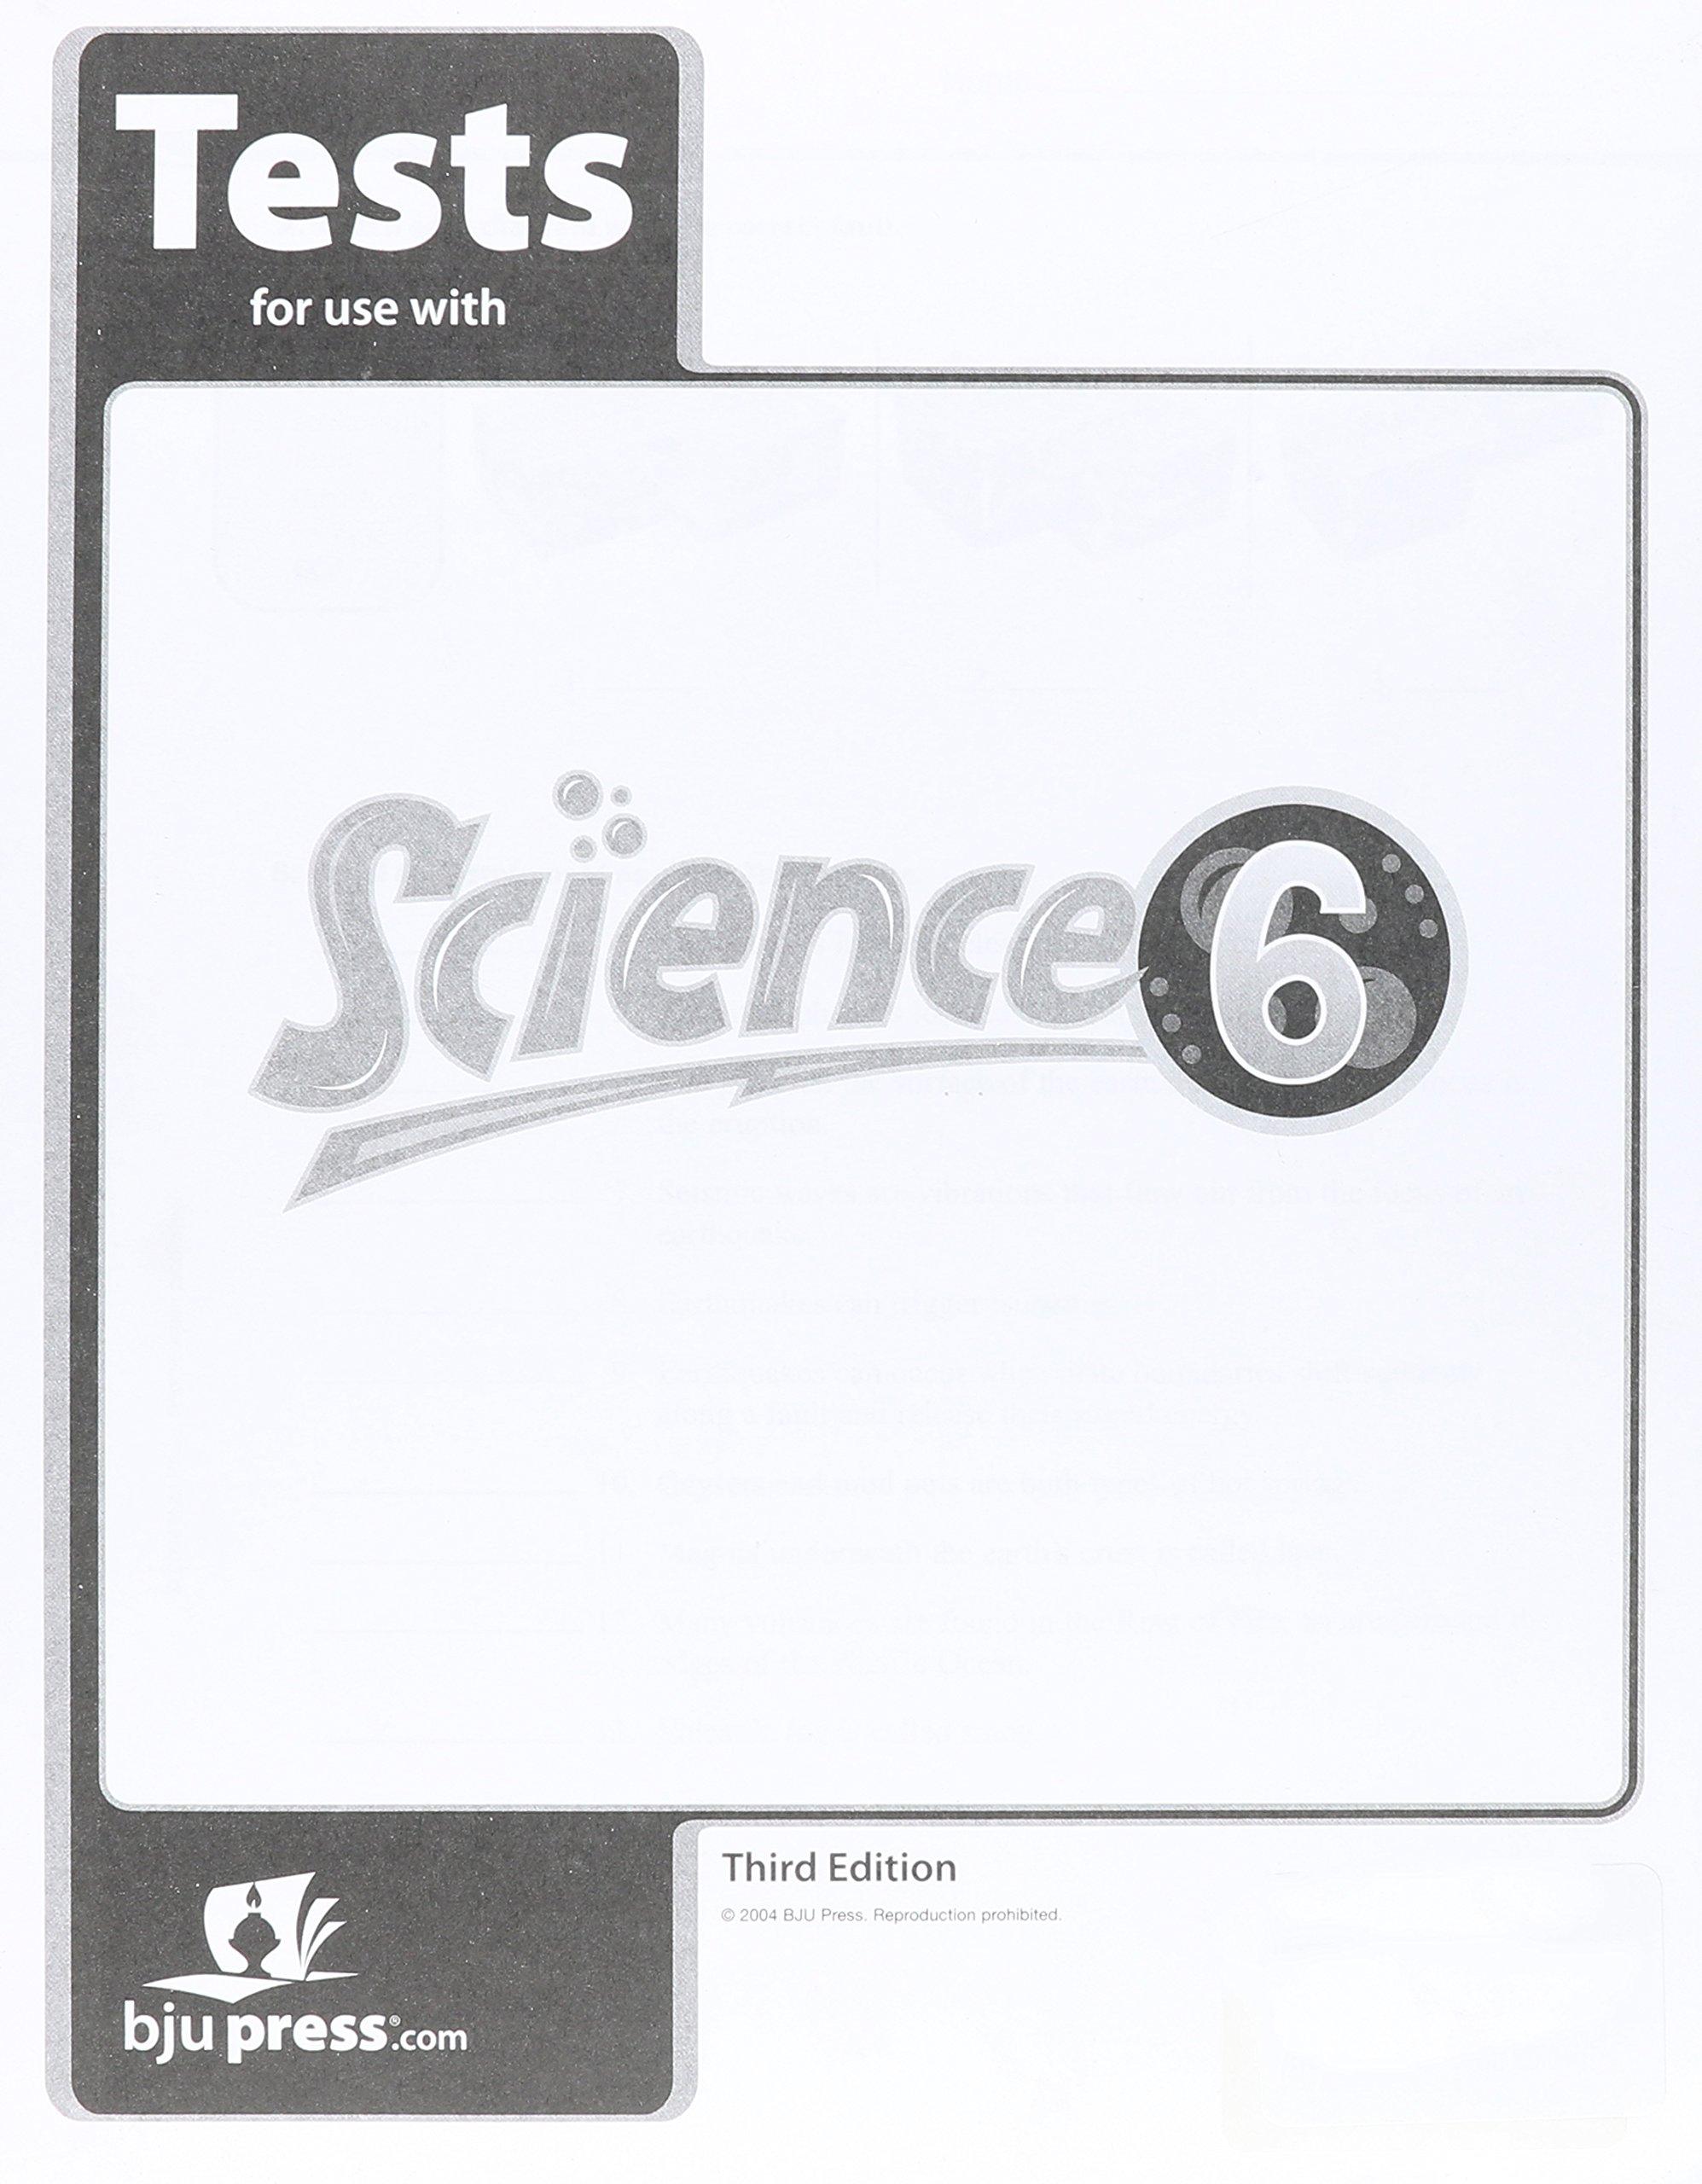 Bju science 6 teacher student text, test answer key, activity.